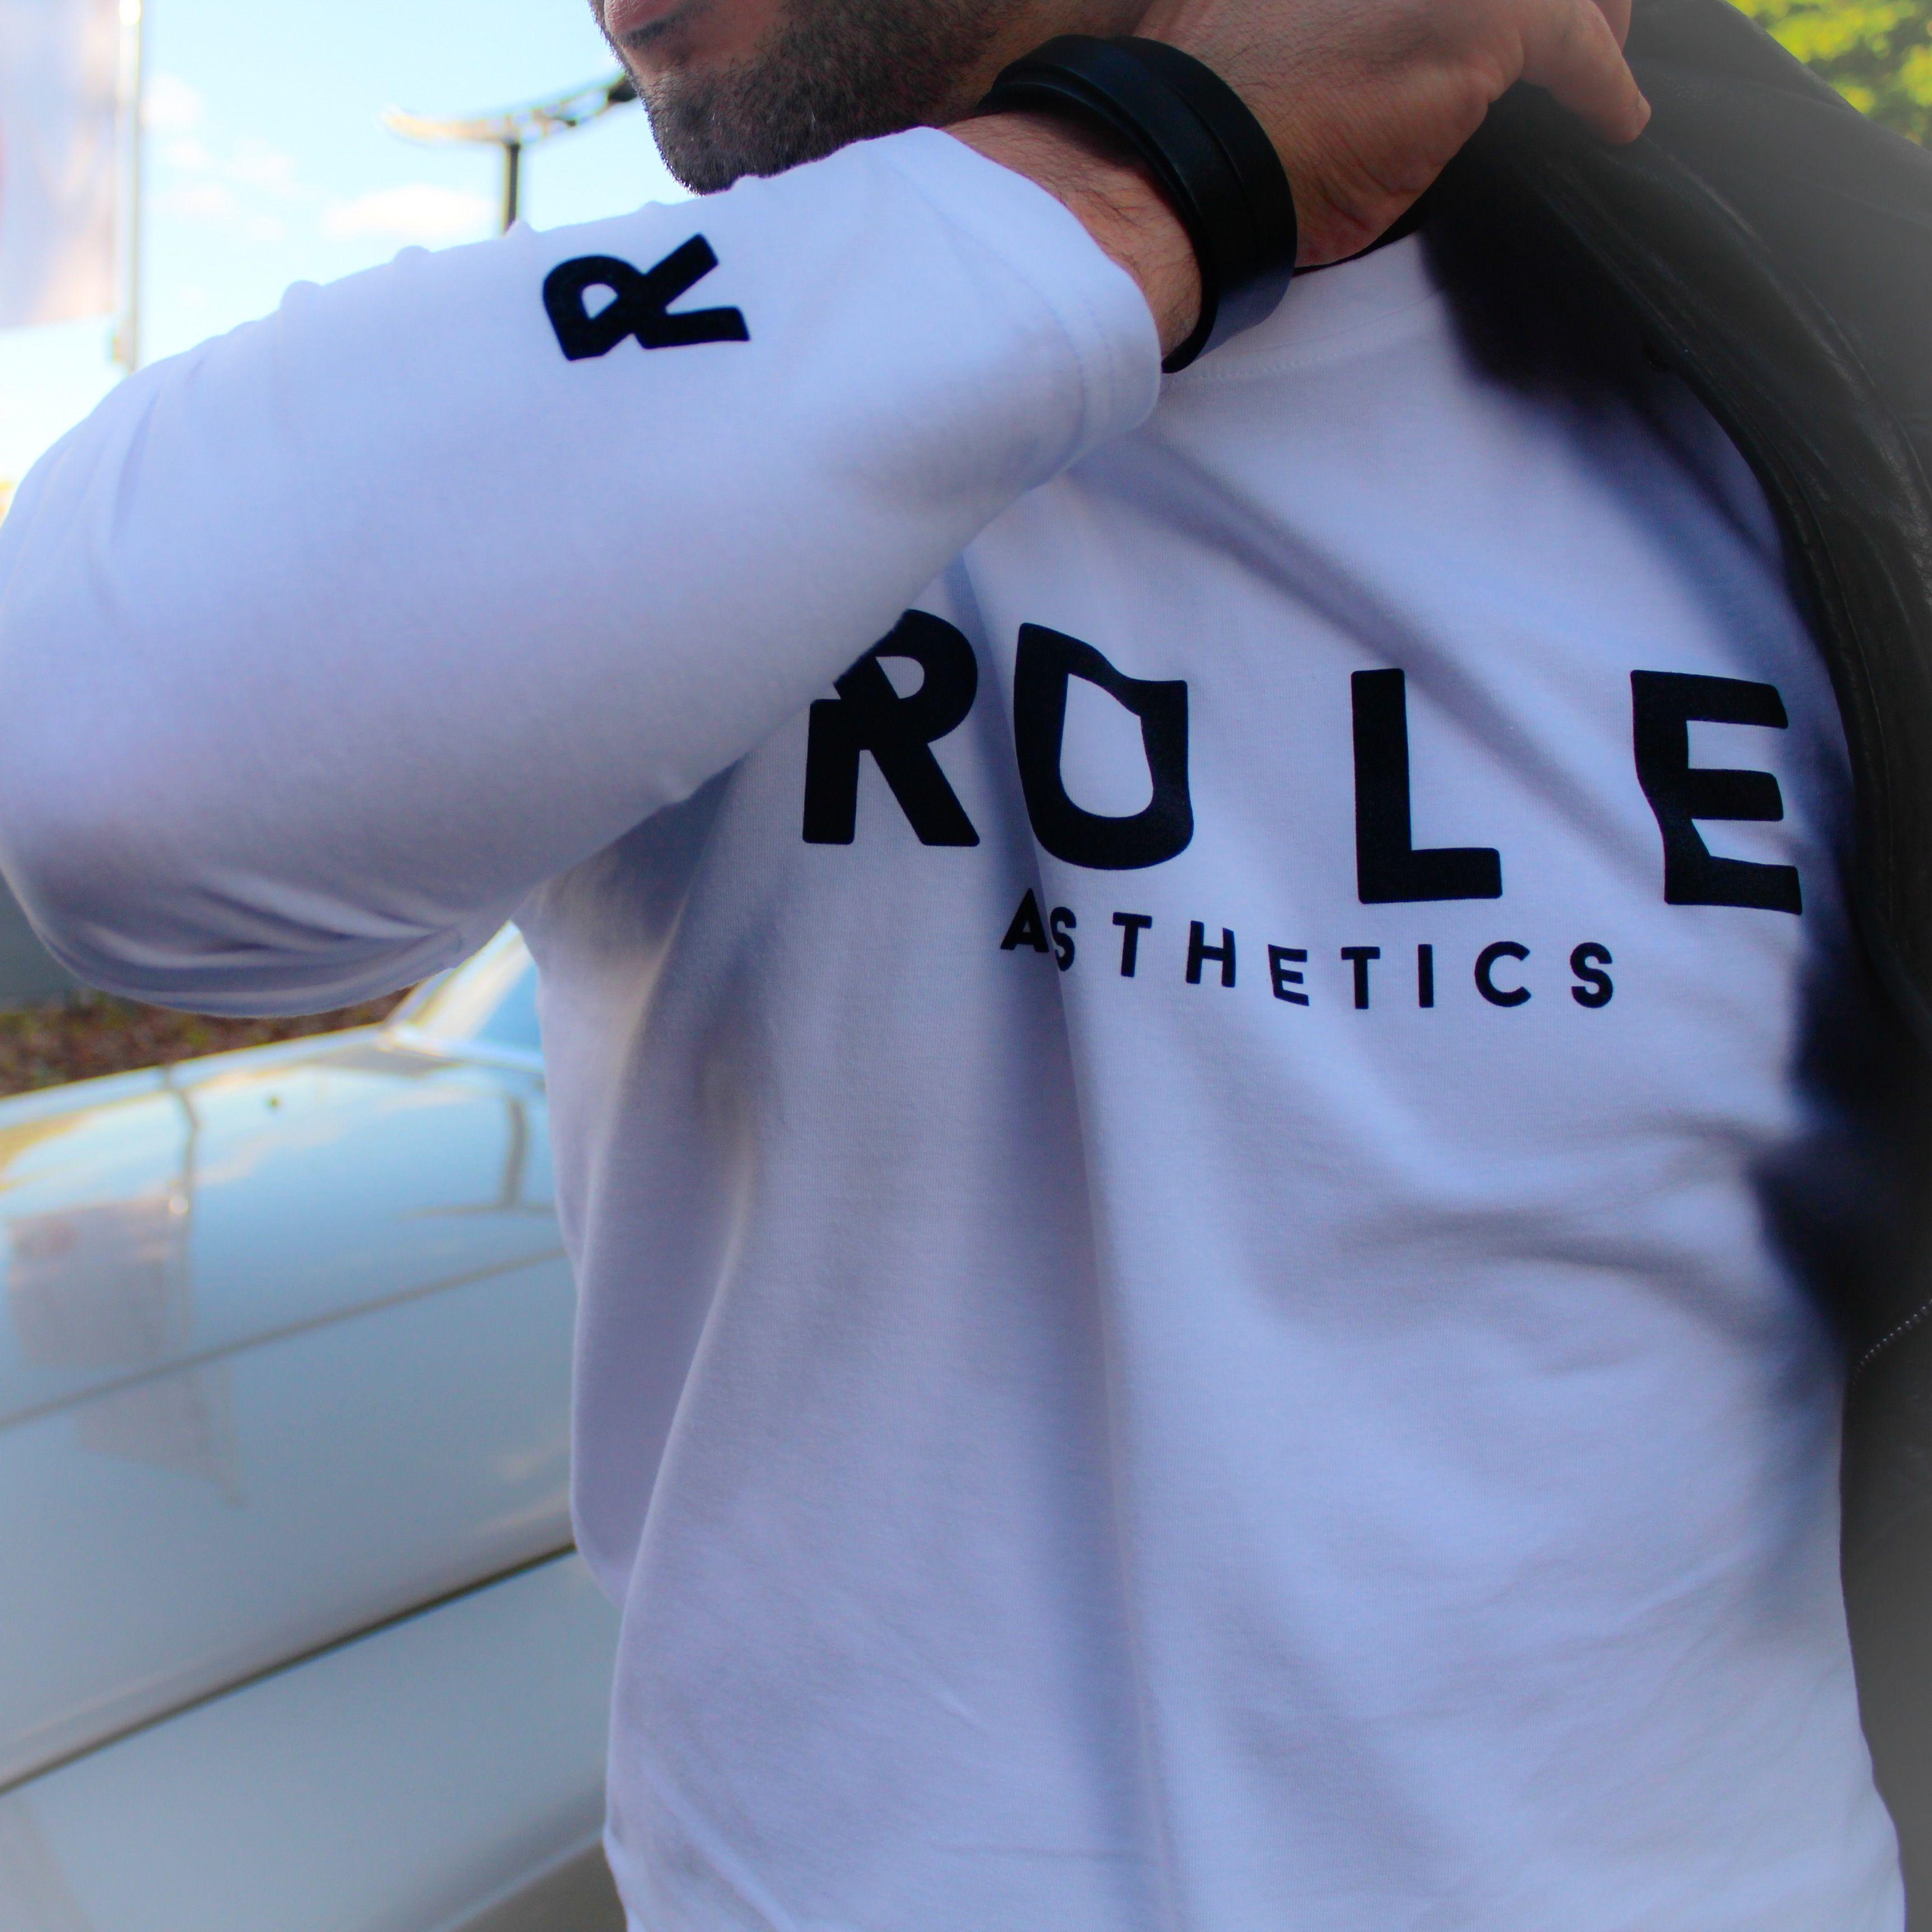 RULE aesthetics White Longsleeve